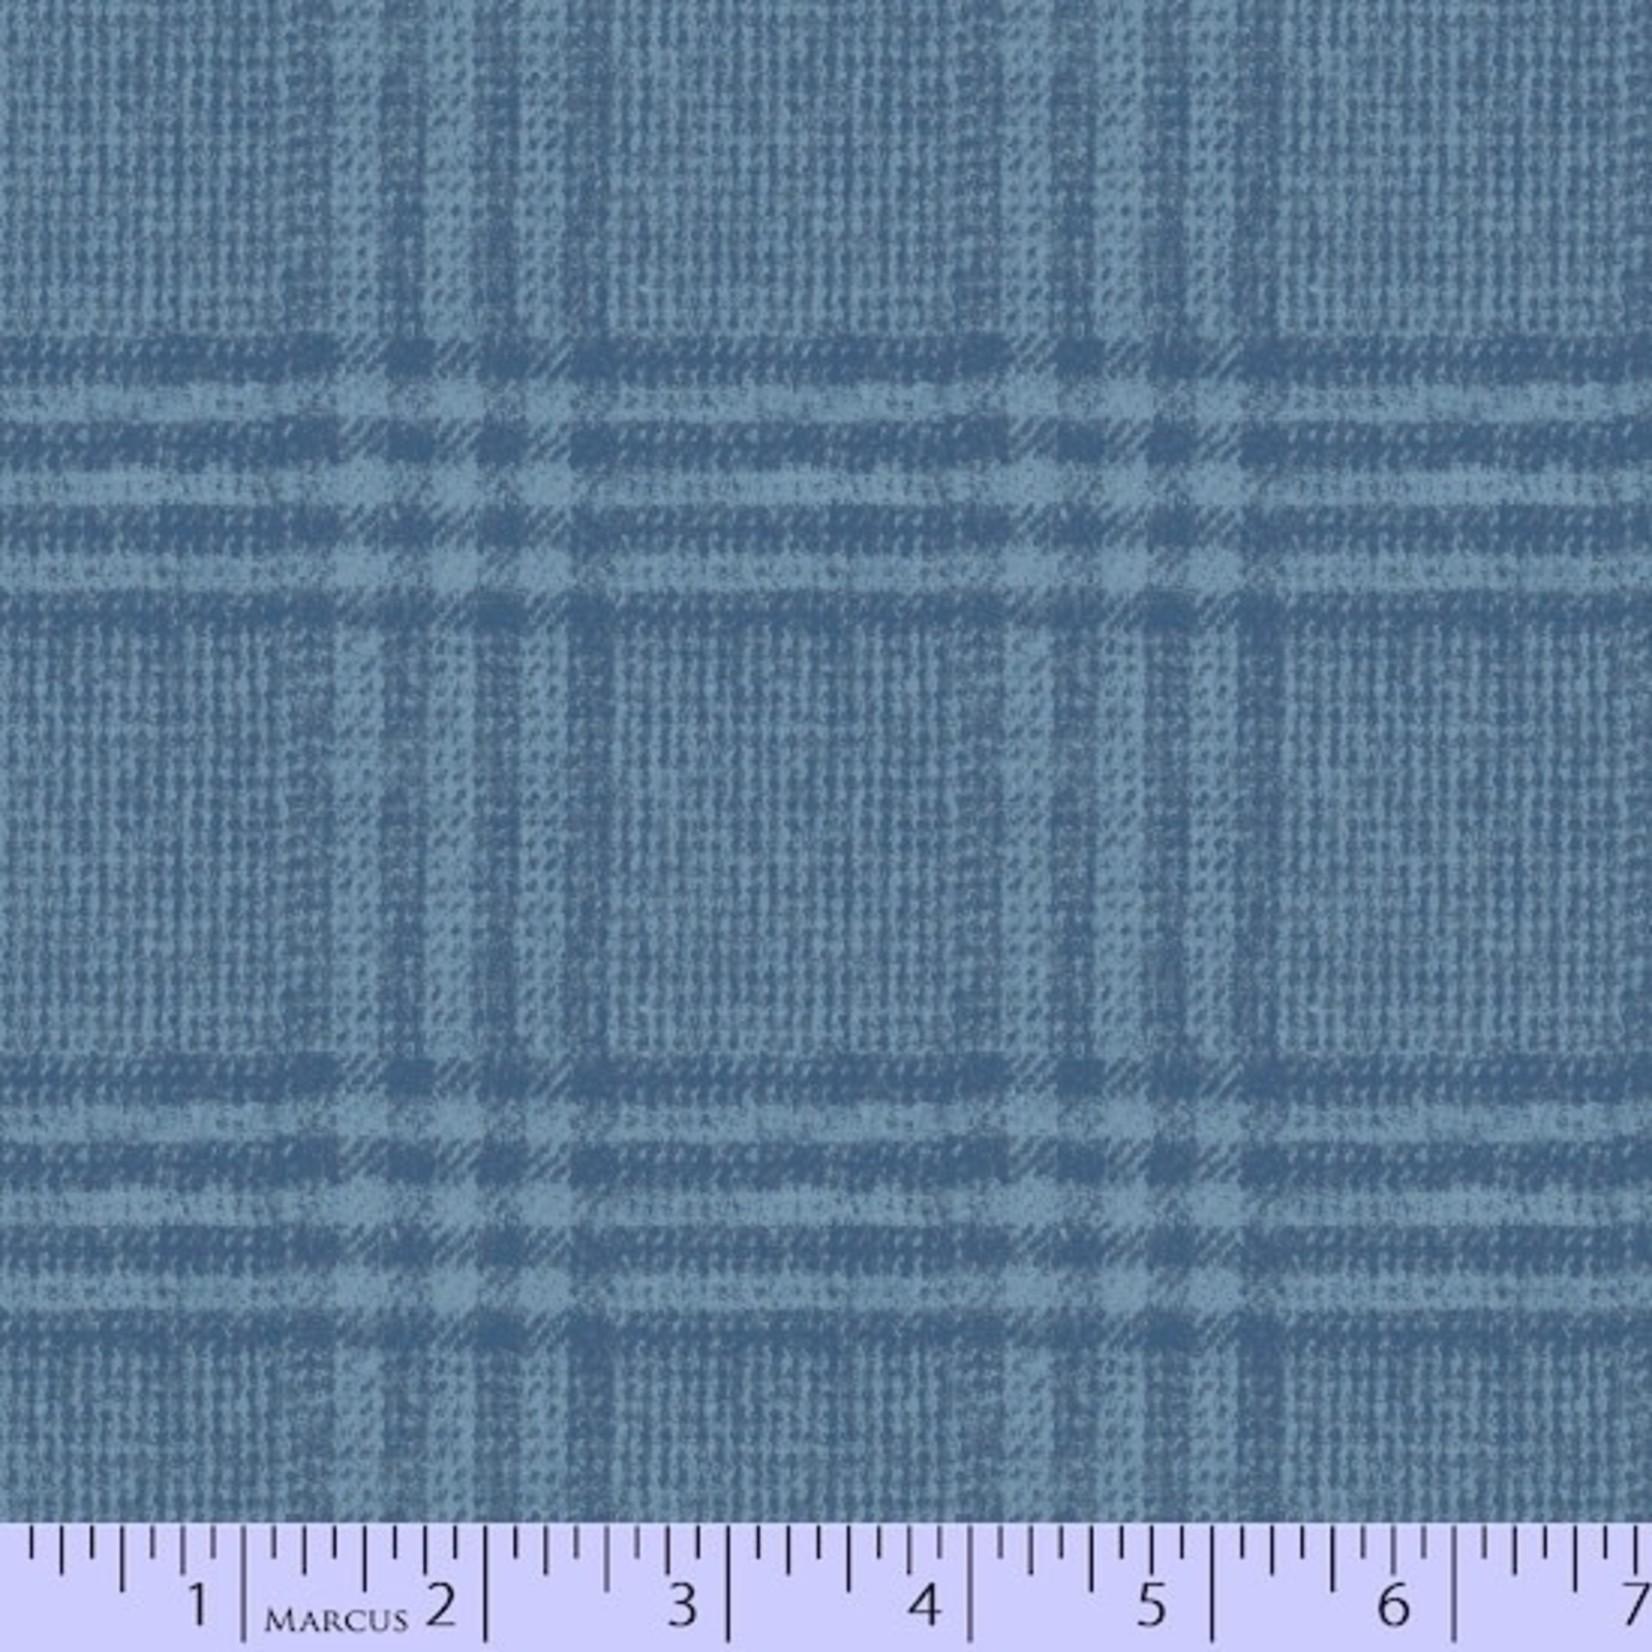 Marcus Fabrics Flannel Blues - Light Blue